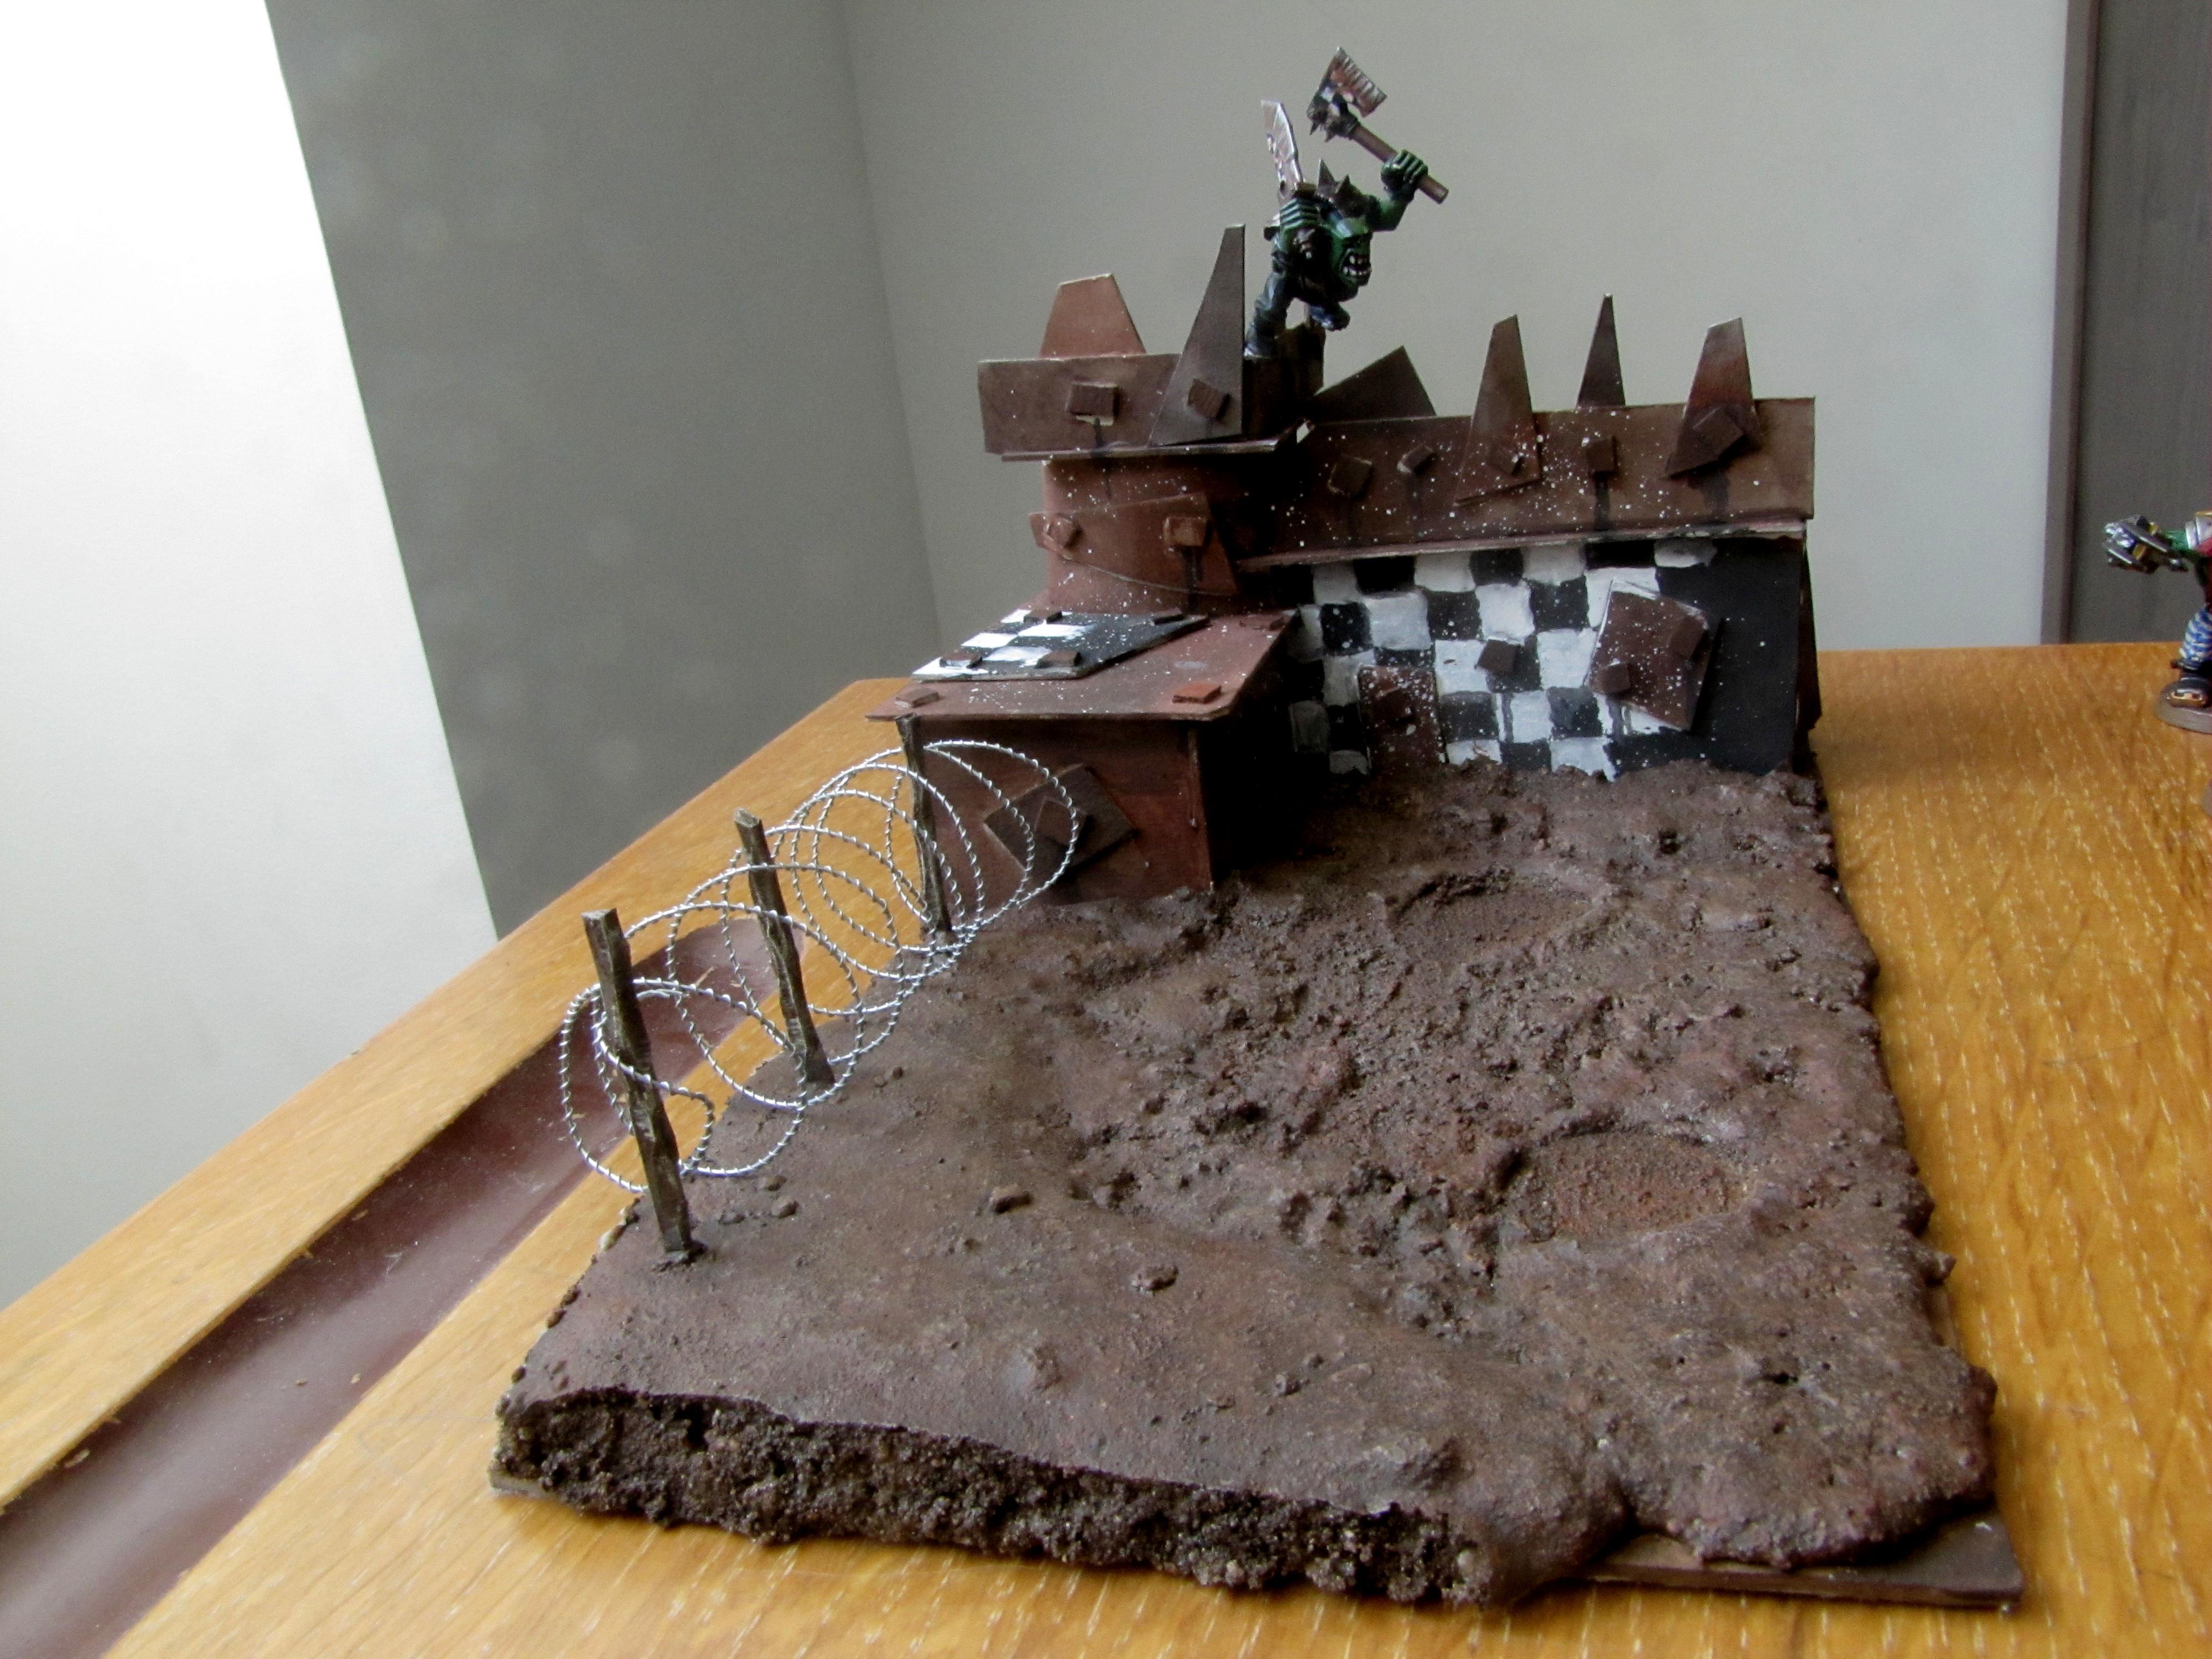 Buildinhg, Dakka Painting Challenge, Goff, Mud, Orks